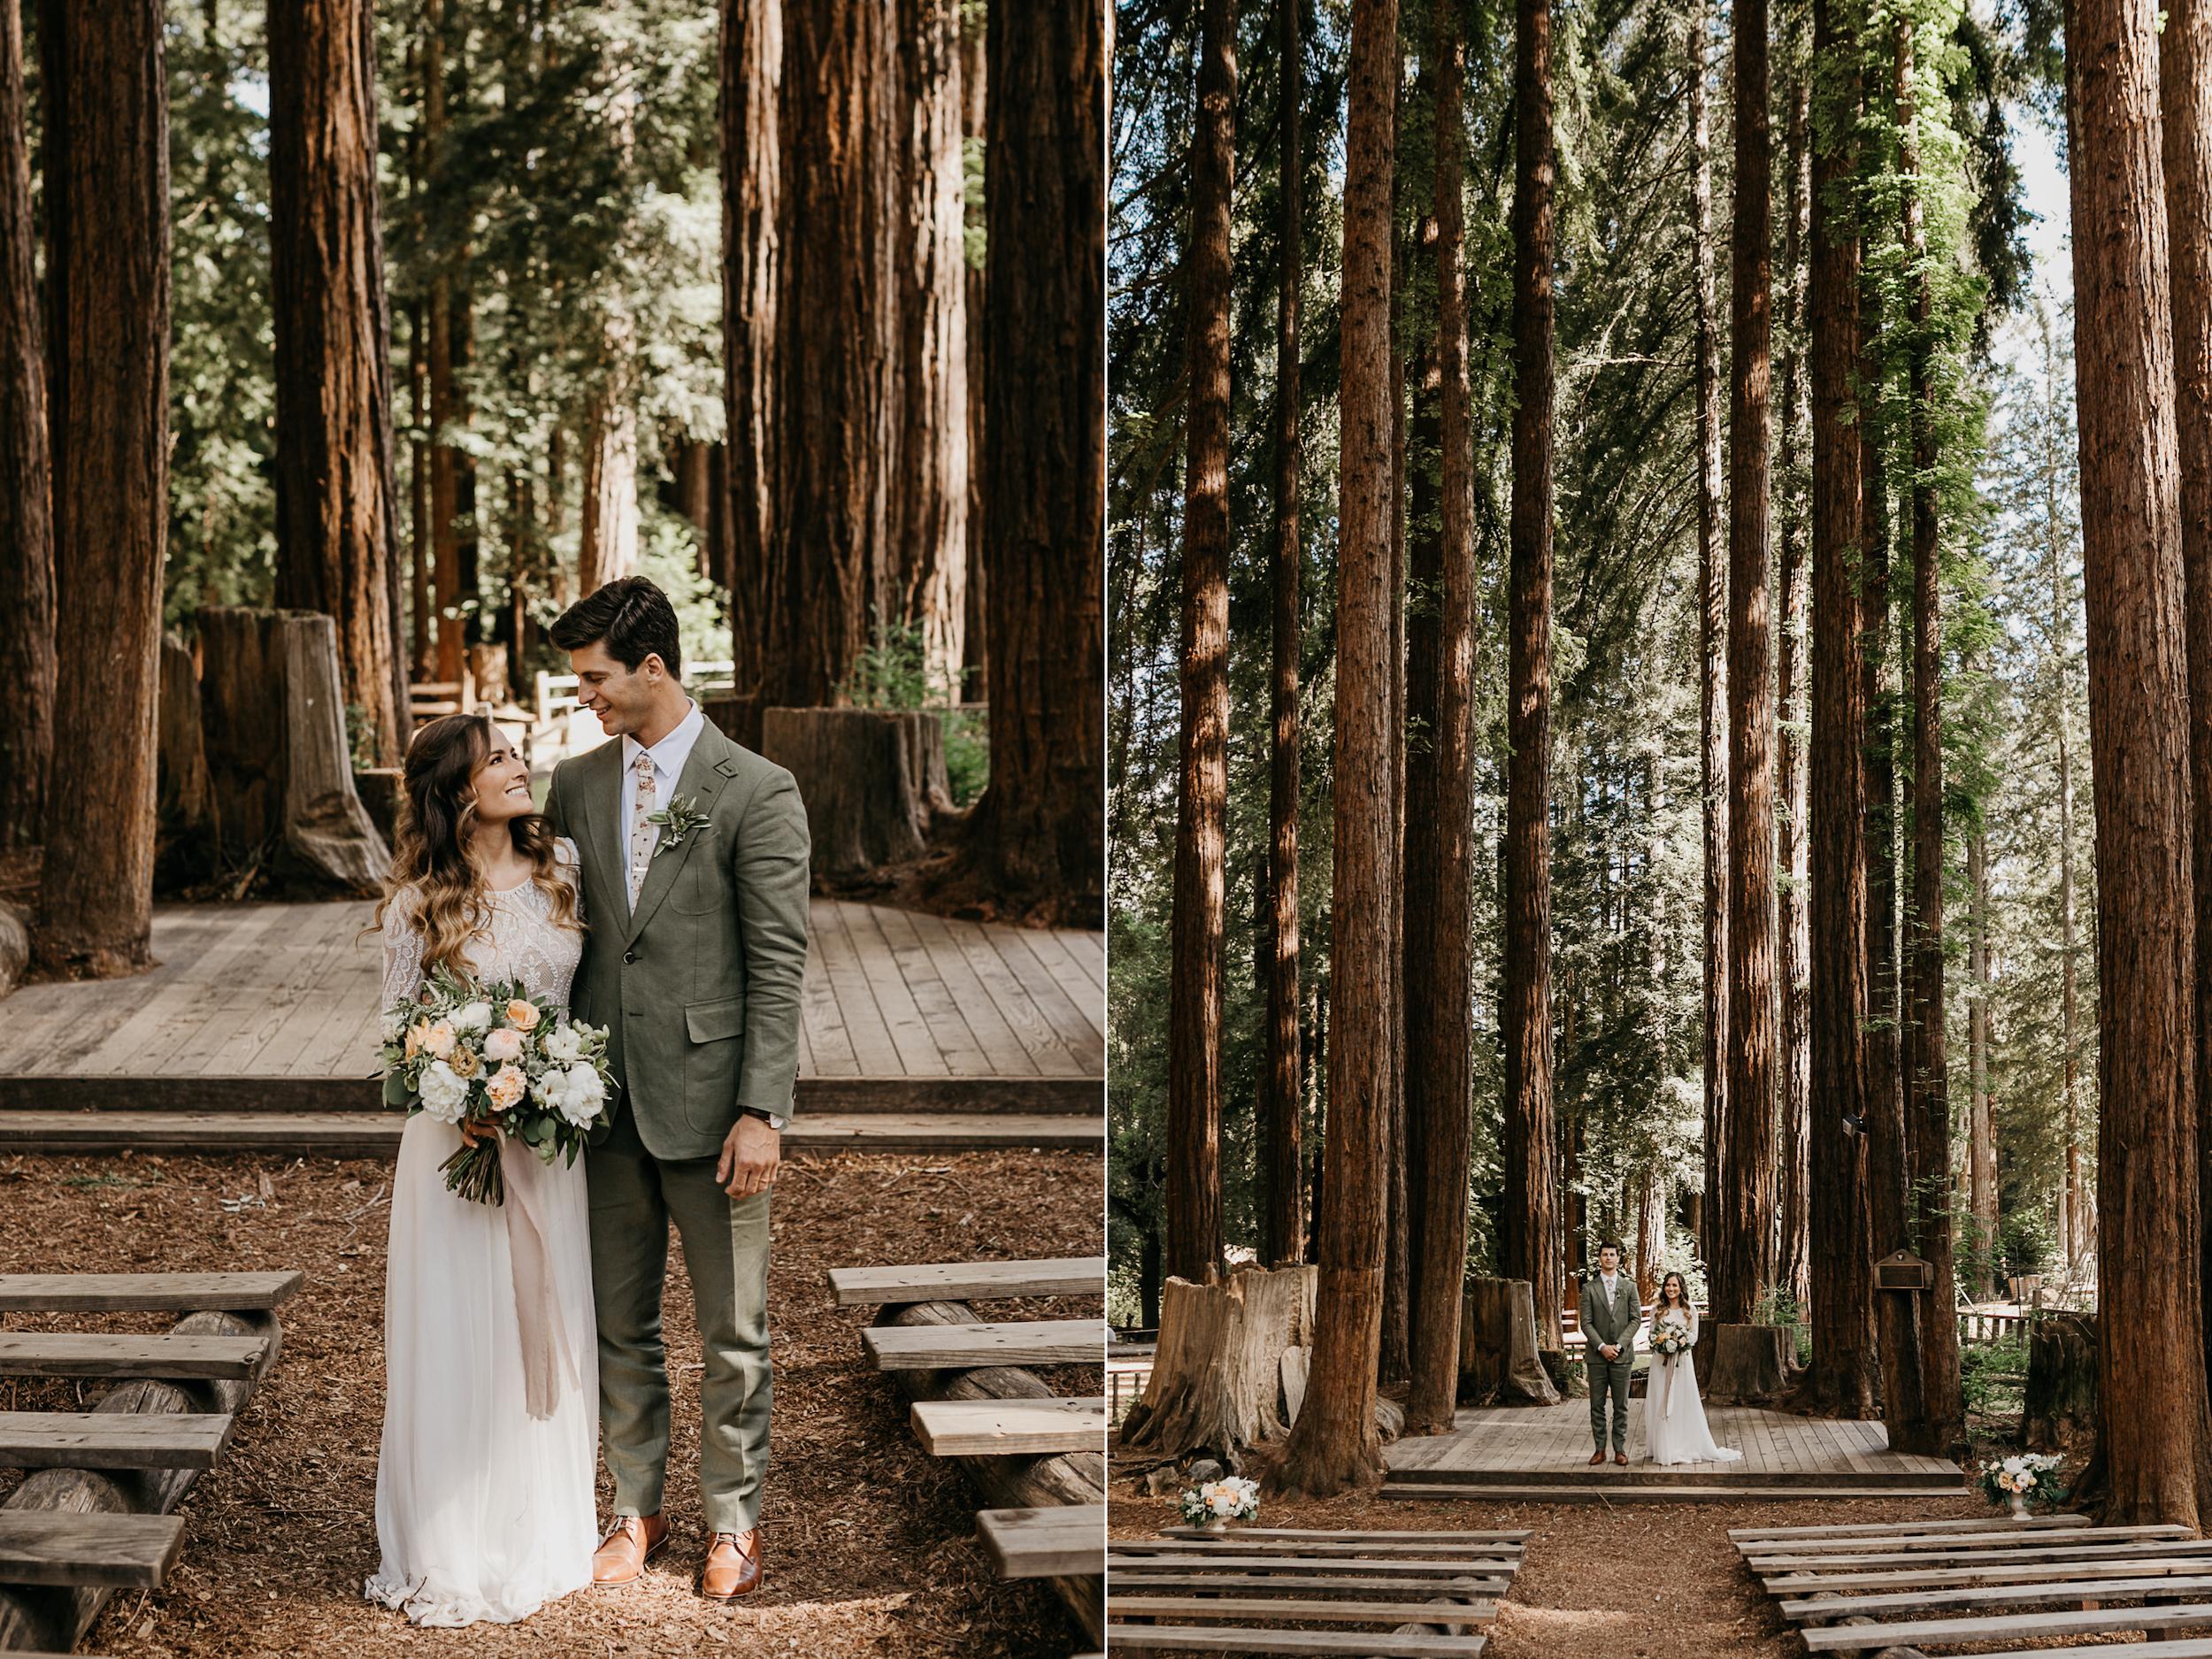 camp campbell-wedding-photographer027.jpg